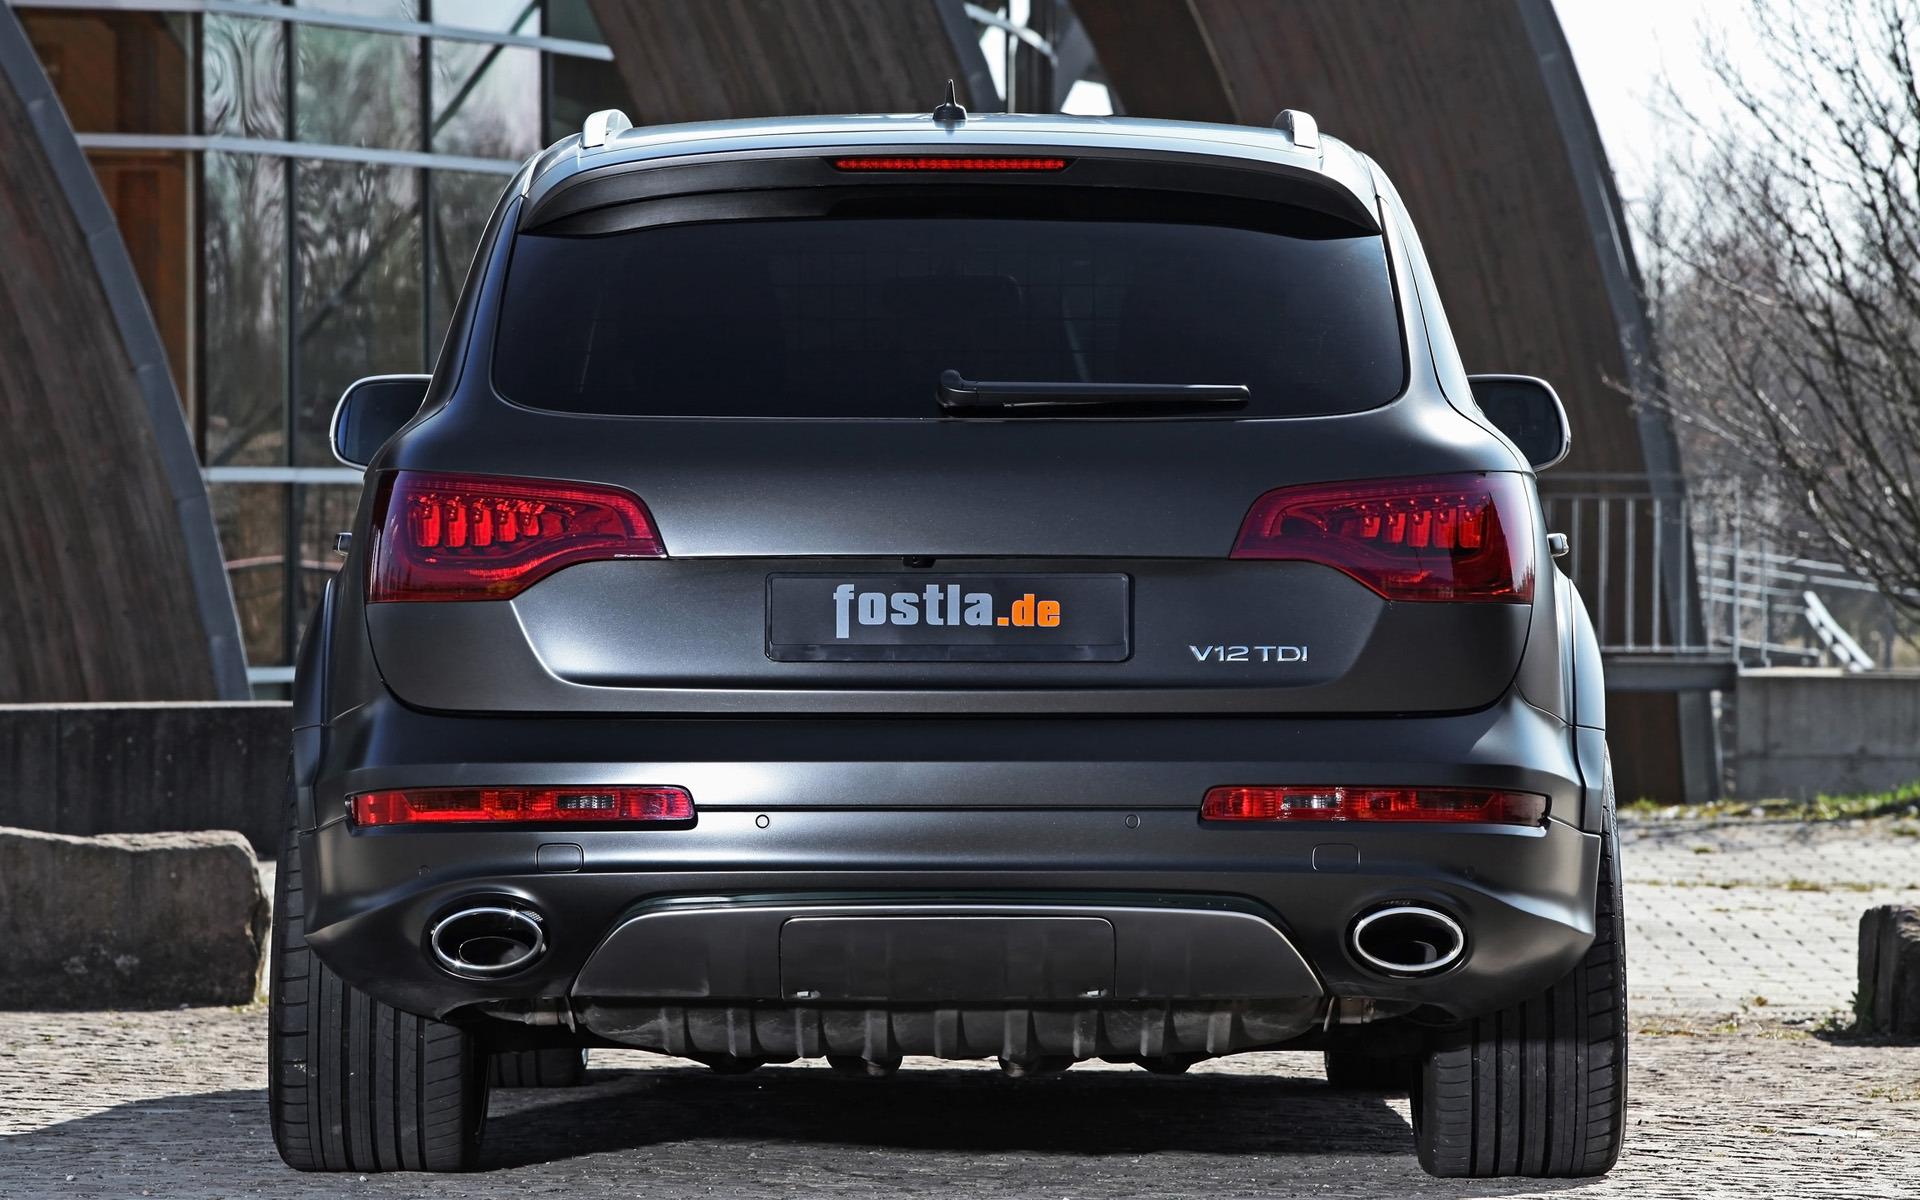 Our audi dealer is a proud member of the penske automotive group. 2012 Fostla Audi Q7 Back View Wallpaper Car Wallpapers 48759